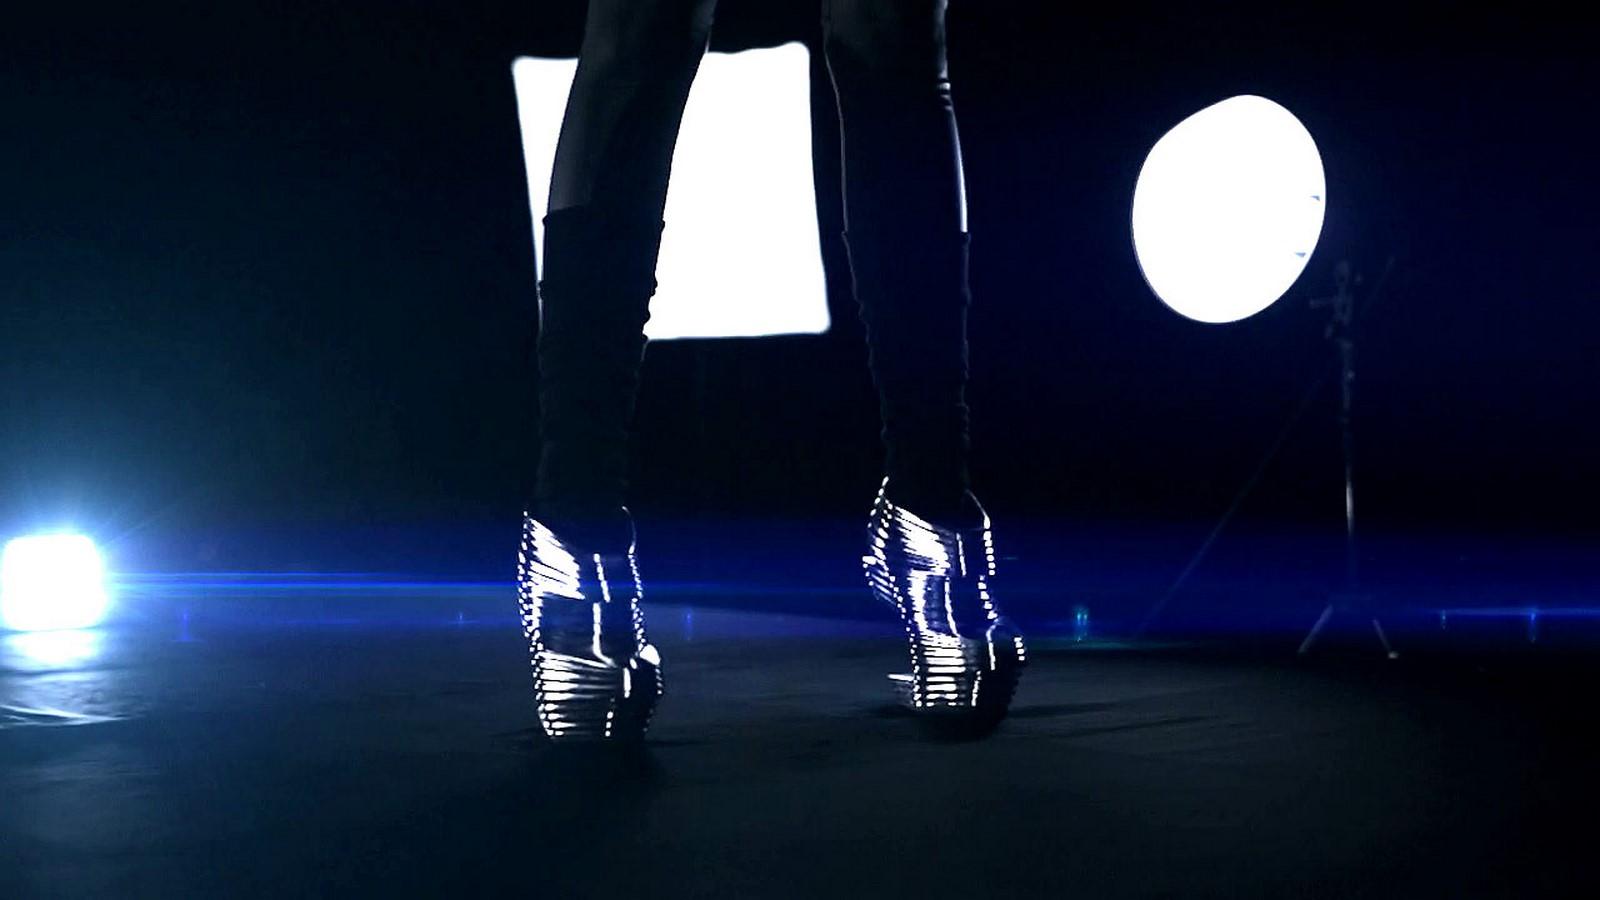 Shoes by Zaha Hadid - Sheet6